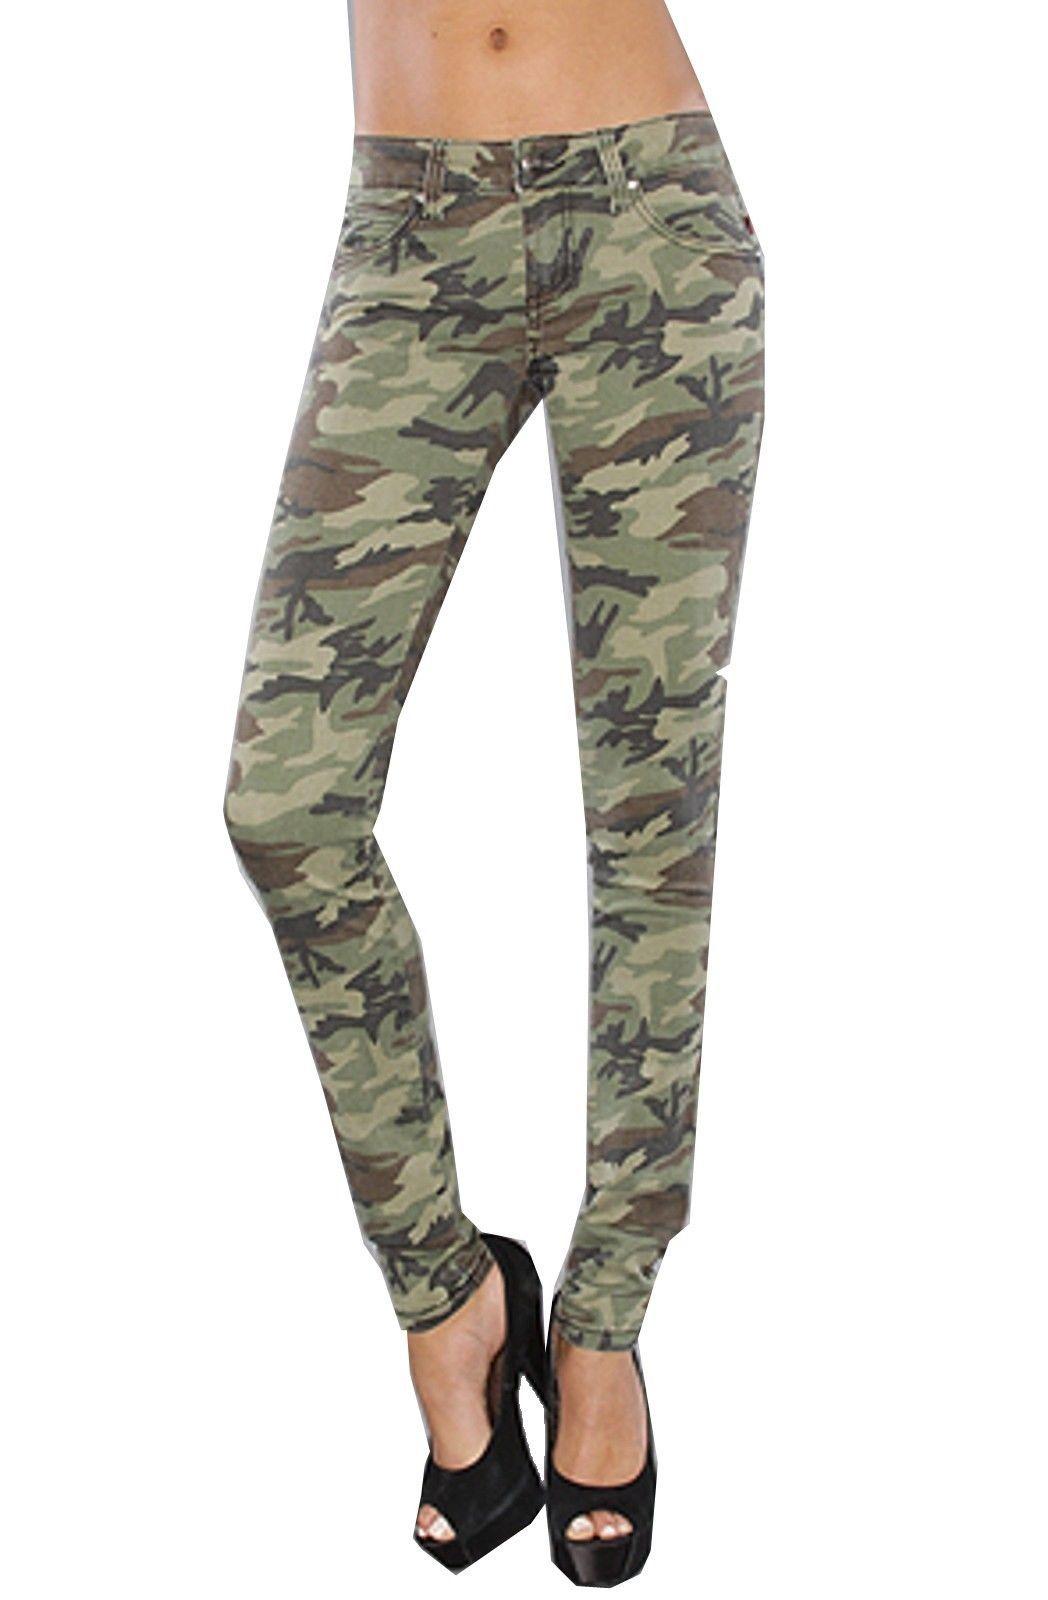 Tripp NYC camouflage Camo Military Skinny Jeans pants